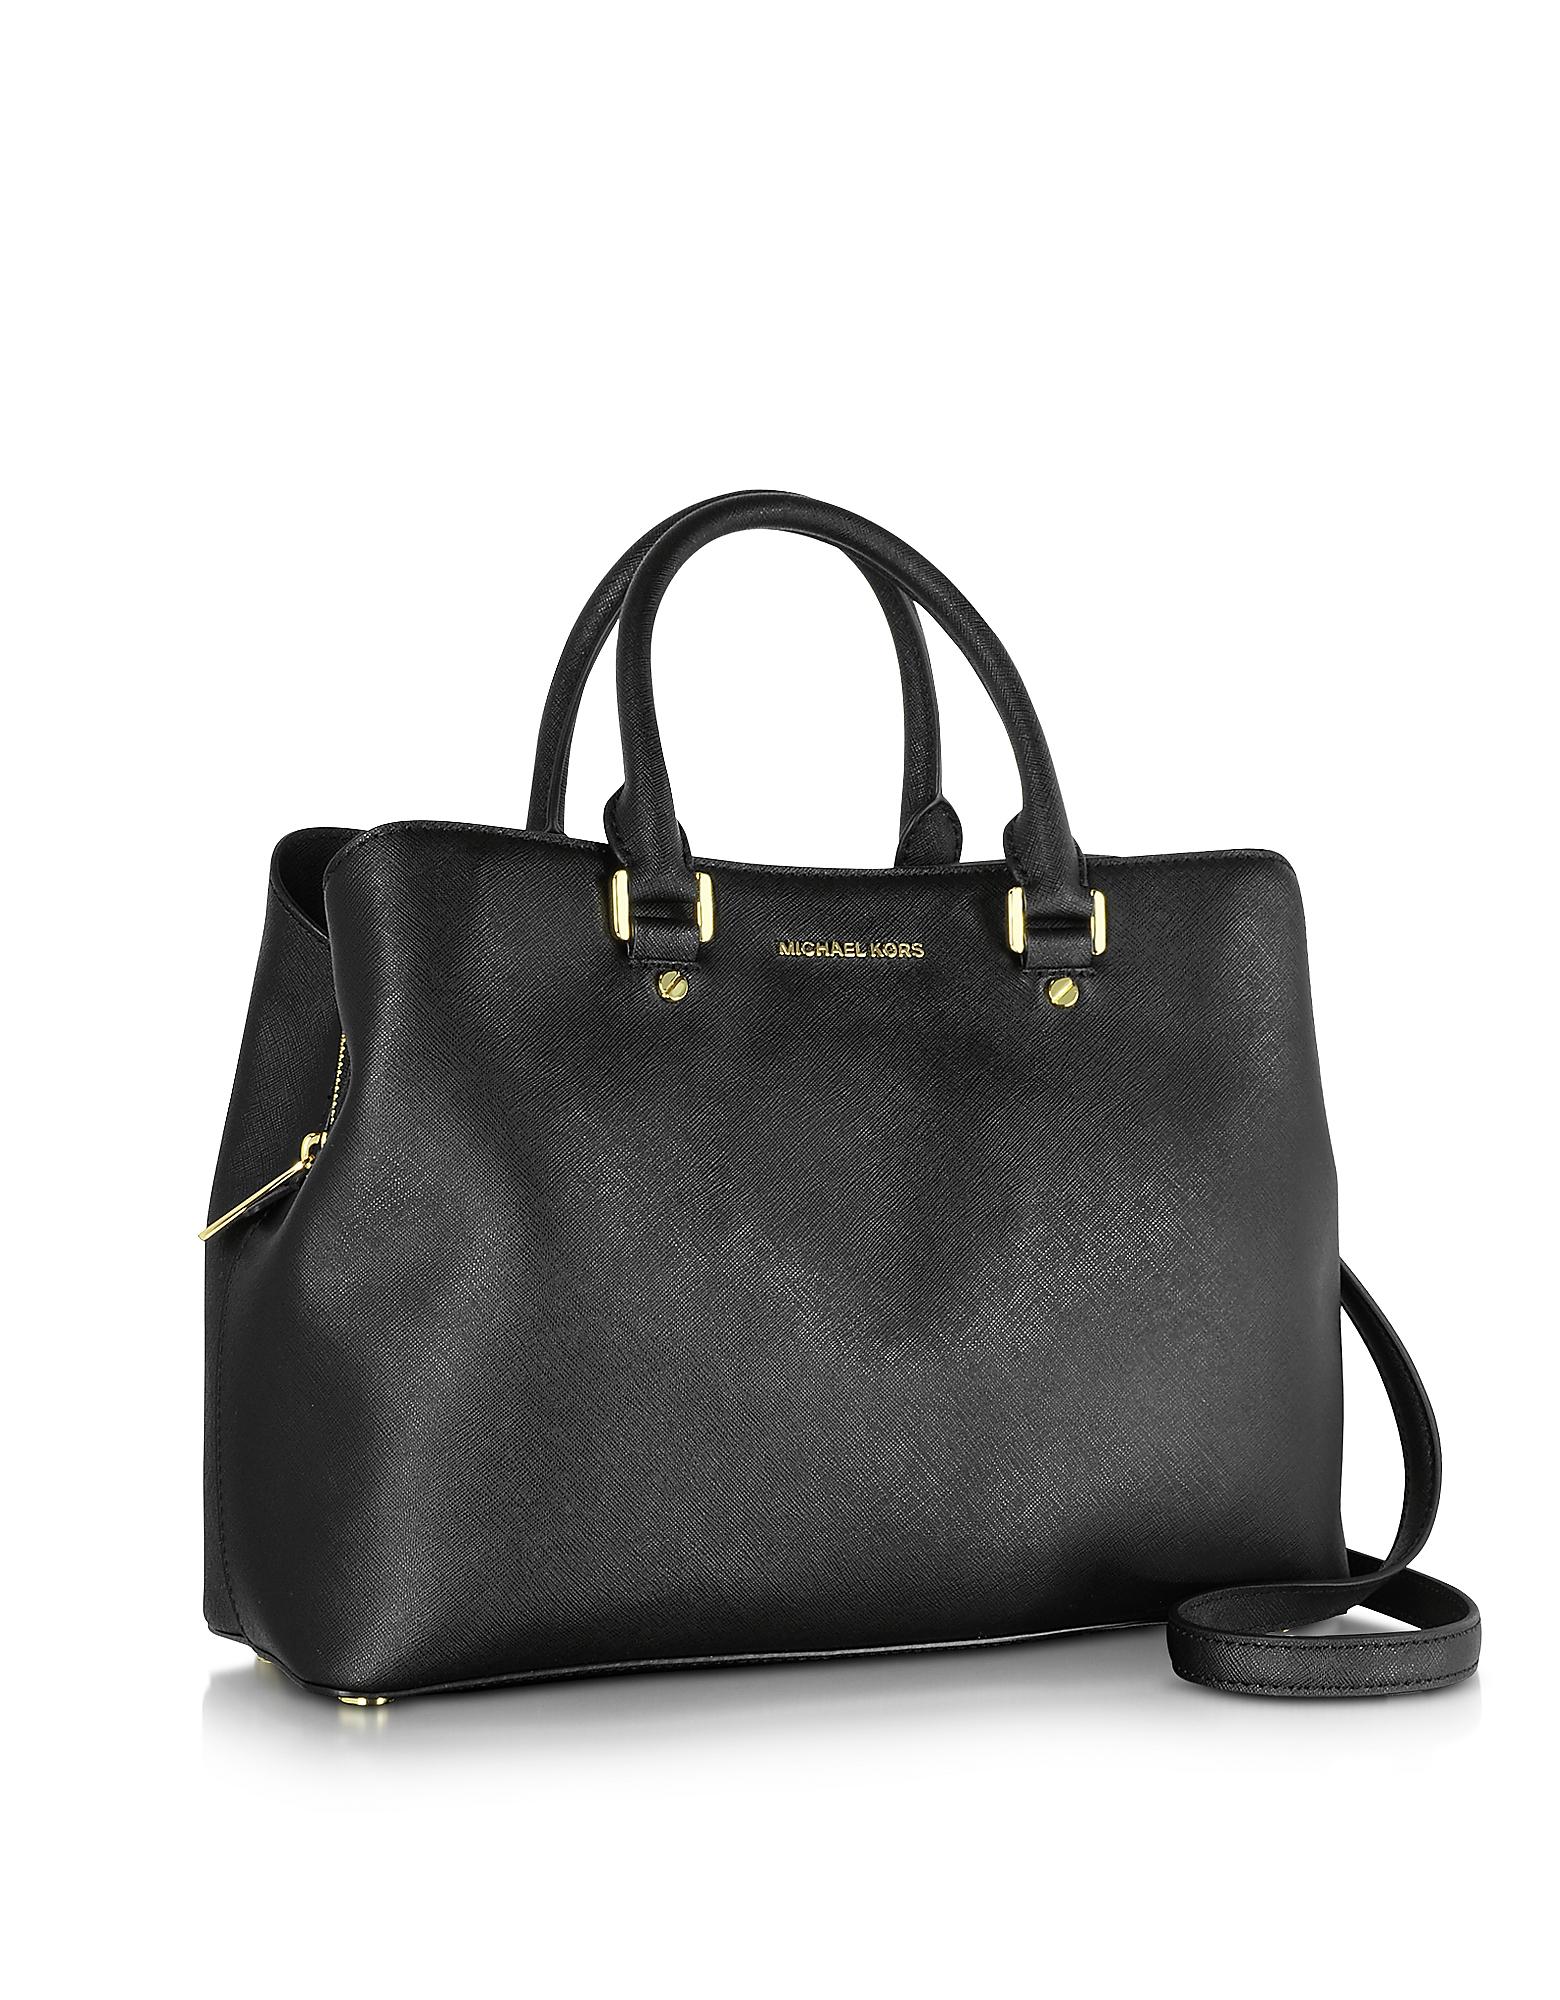 fa4a3dd5e36fe3 Lyst - Michael Kors Savannah Large Saffiano Leather Satchel Bag in Black